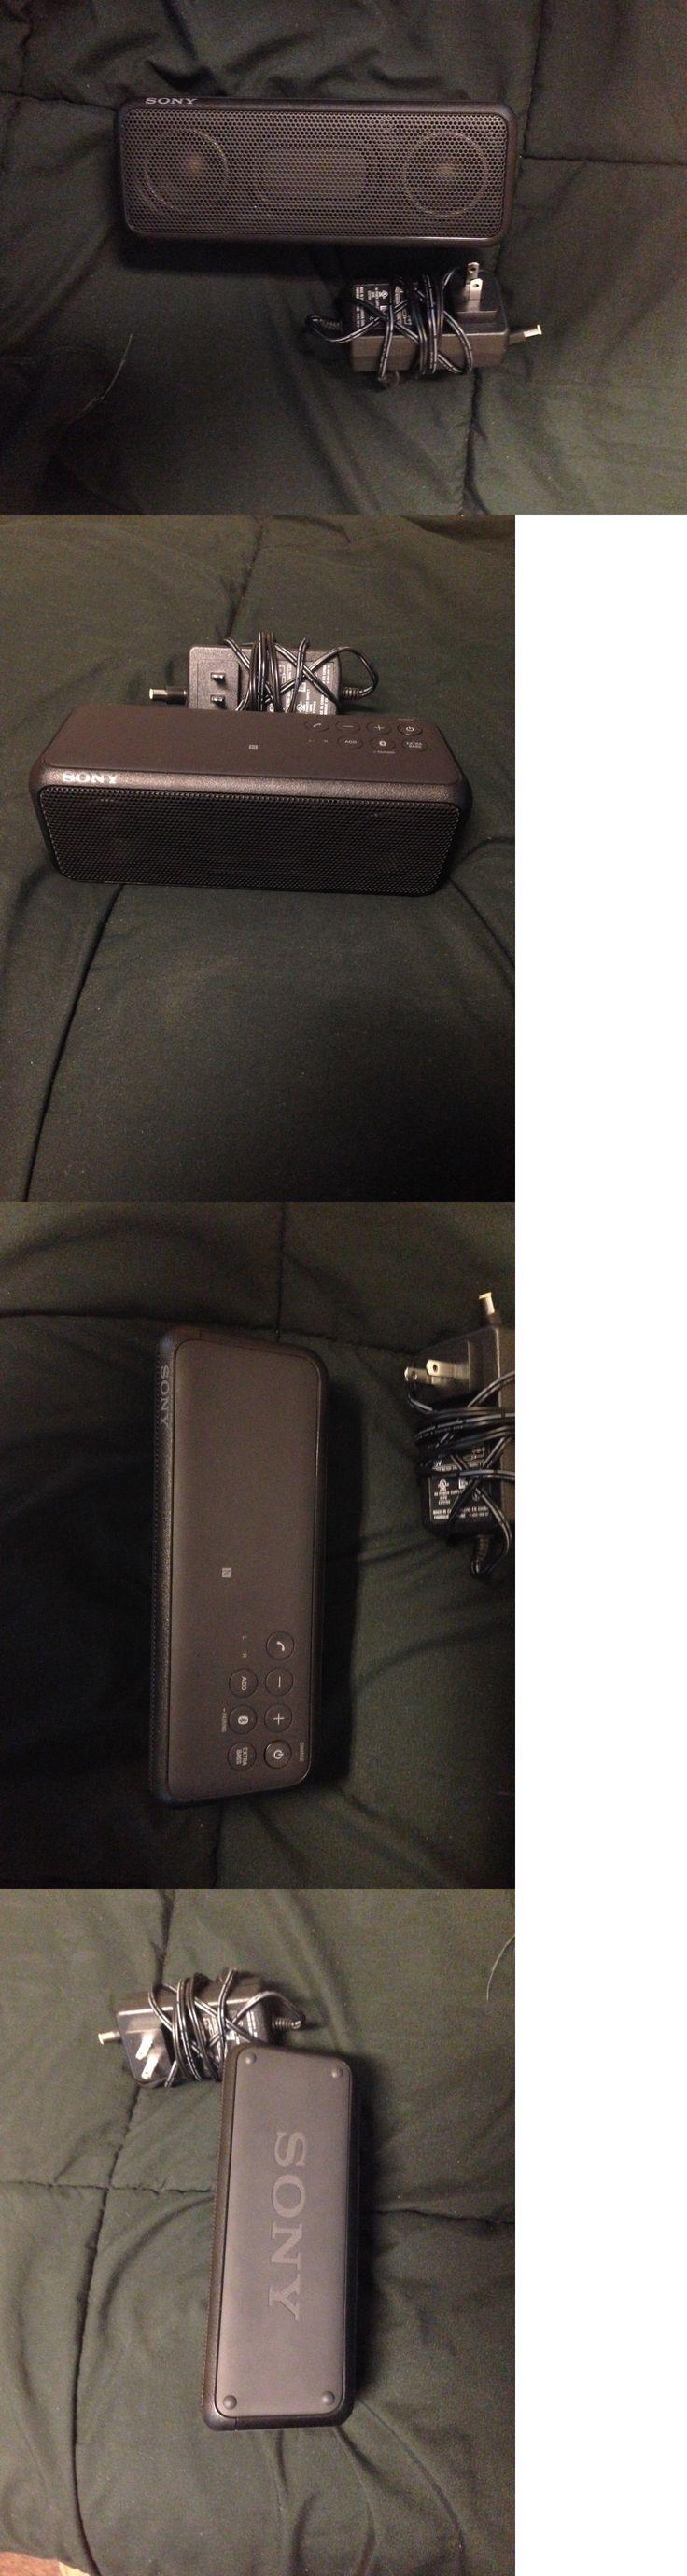 Other Portable Audio: Sony Srsxb3 Black Srs-Xb3 Portable Bluetooth Wireless Speaker Black New -> BUY IT NOW ONLY: $55 on eBay!